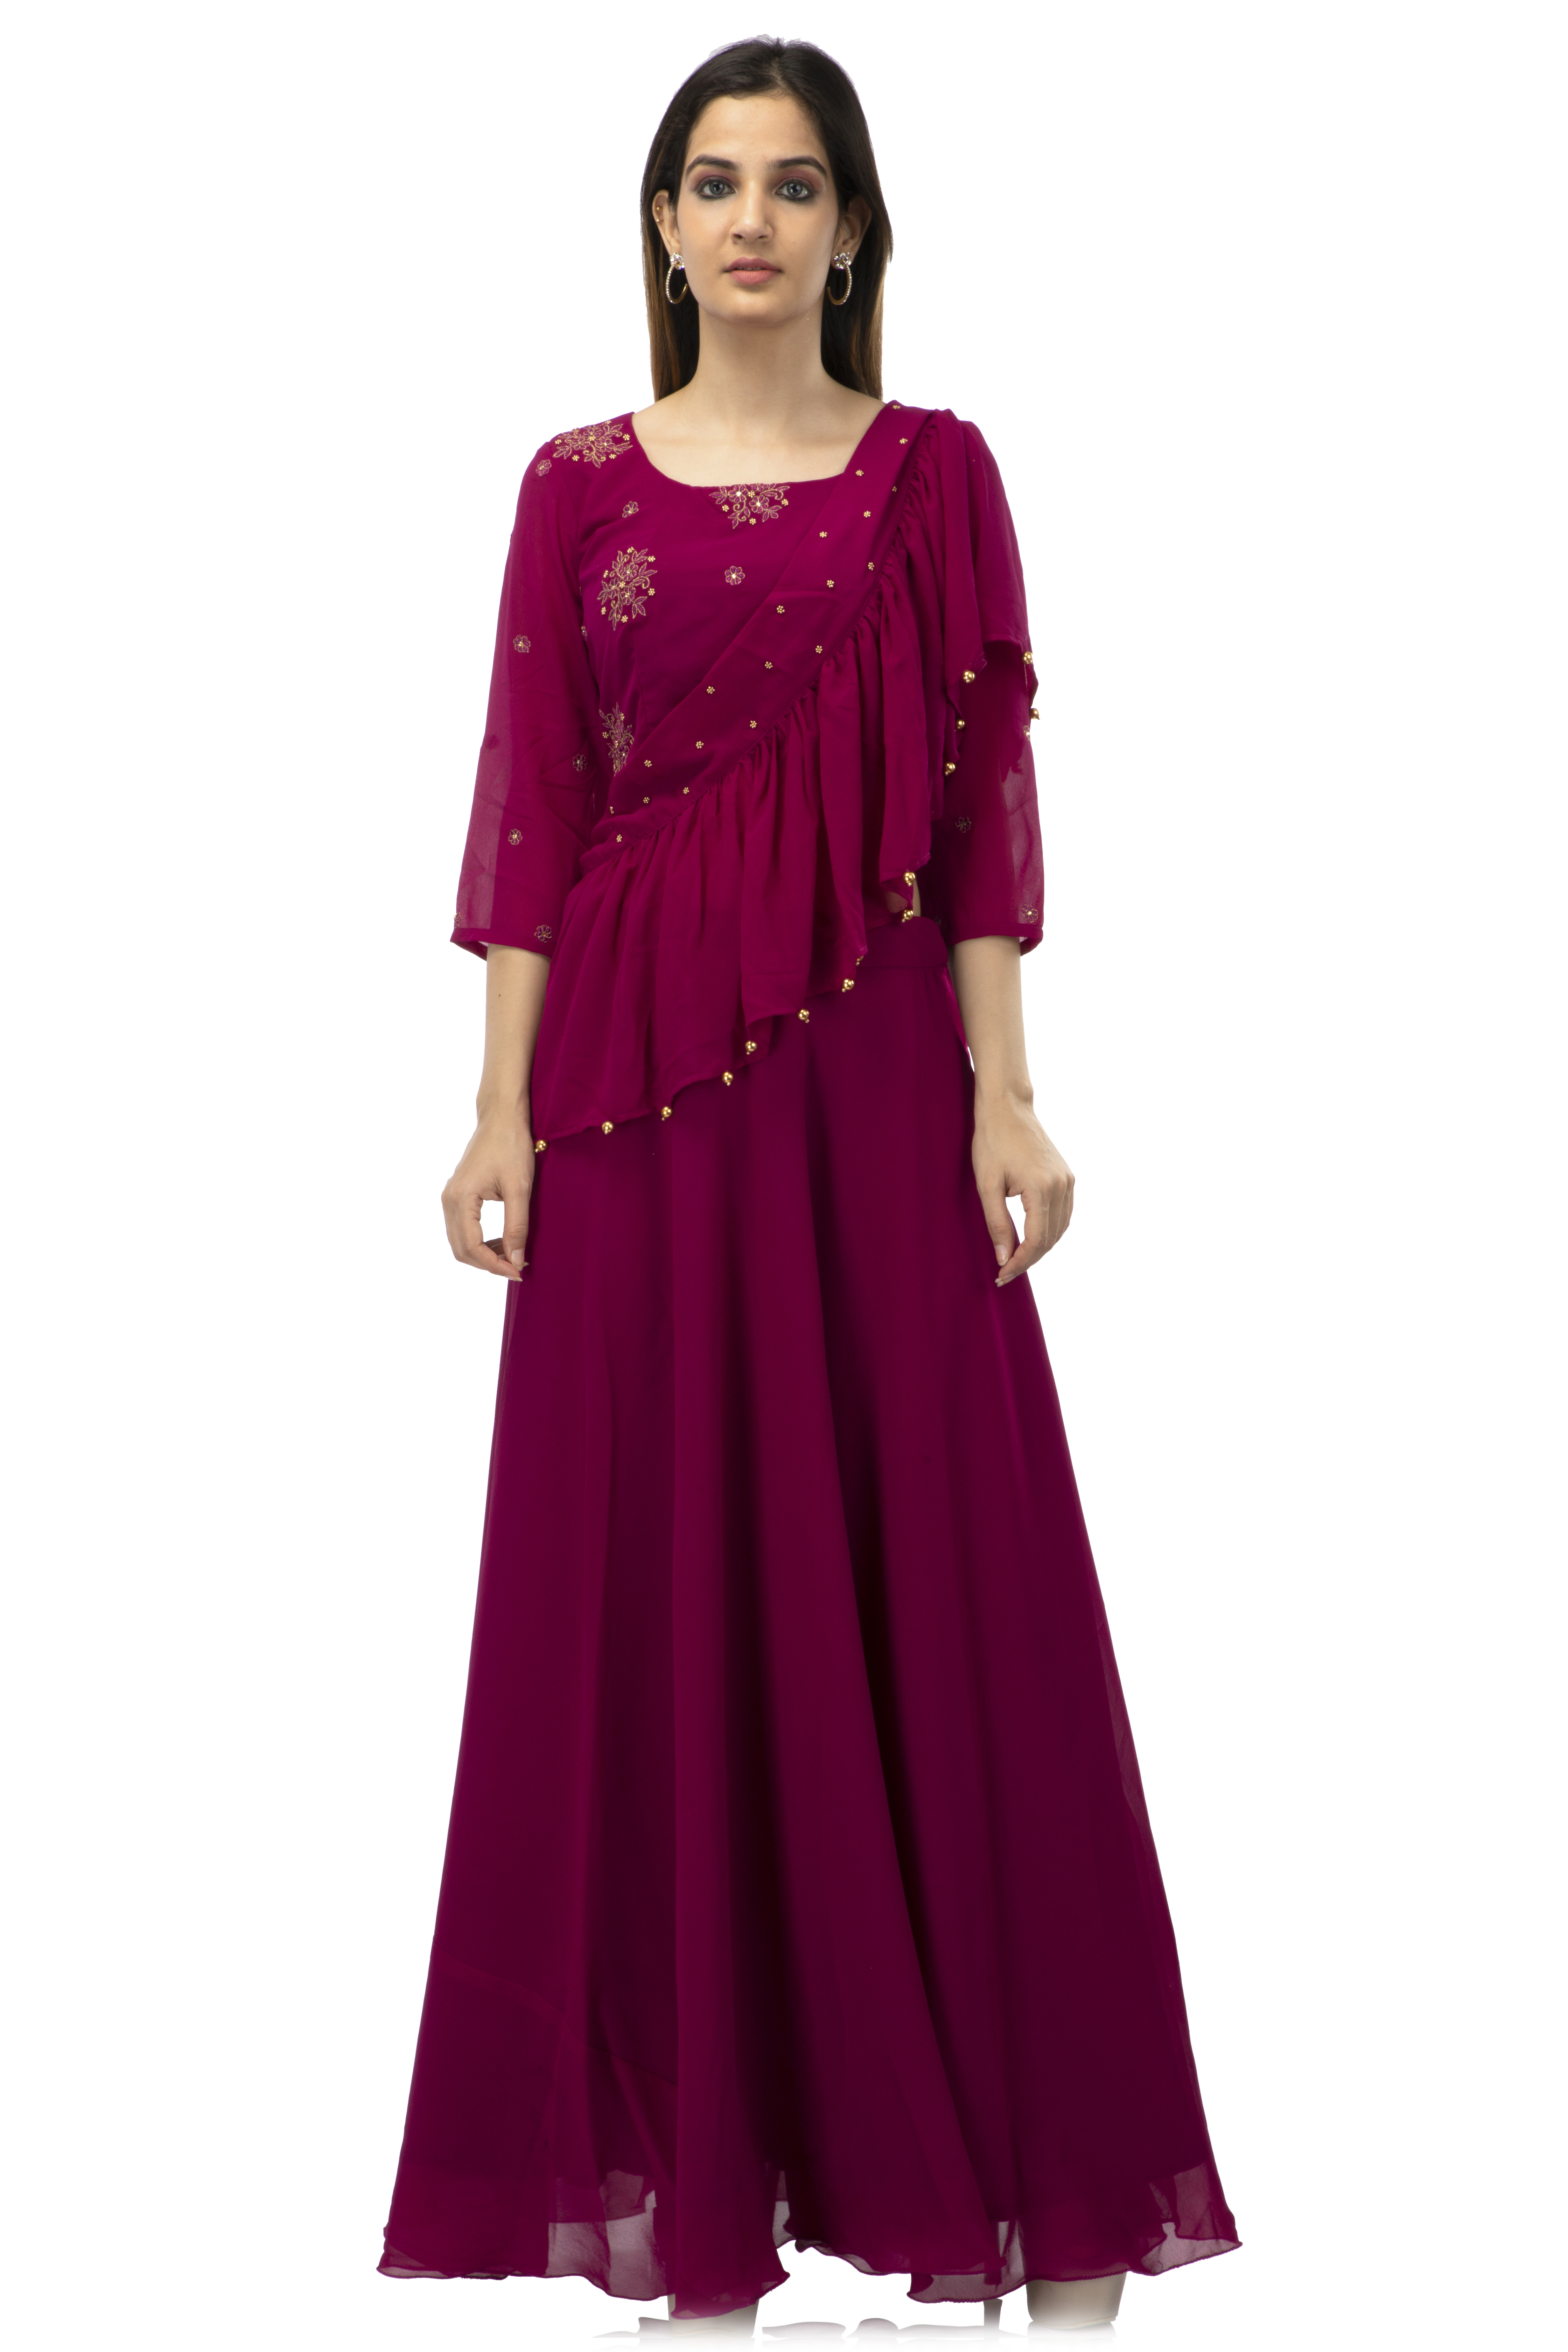 becoming | Sari skirt with ruffle detailing